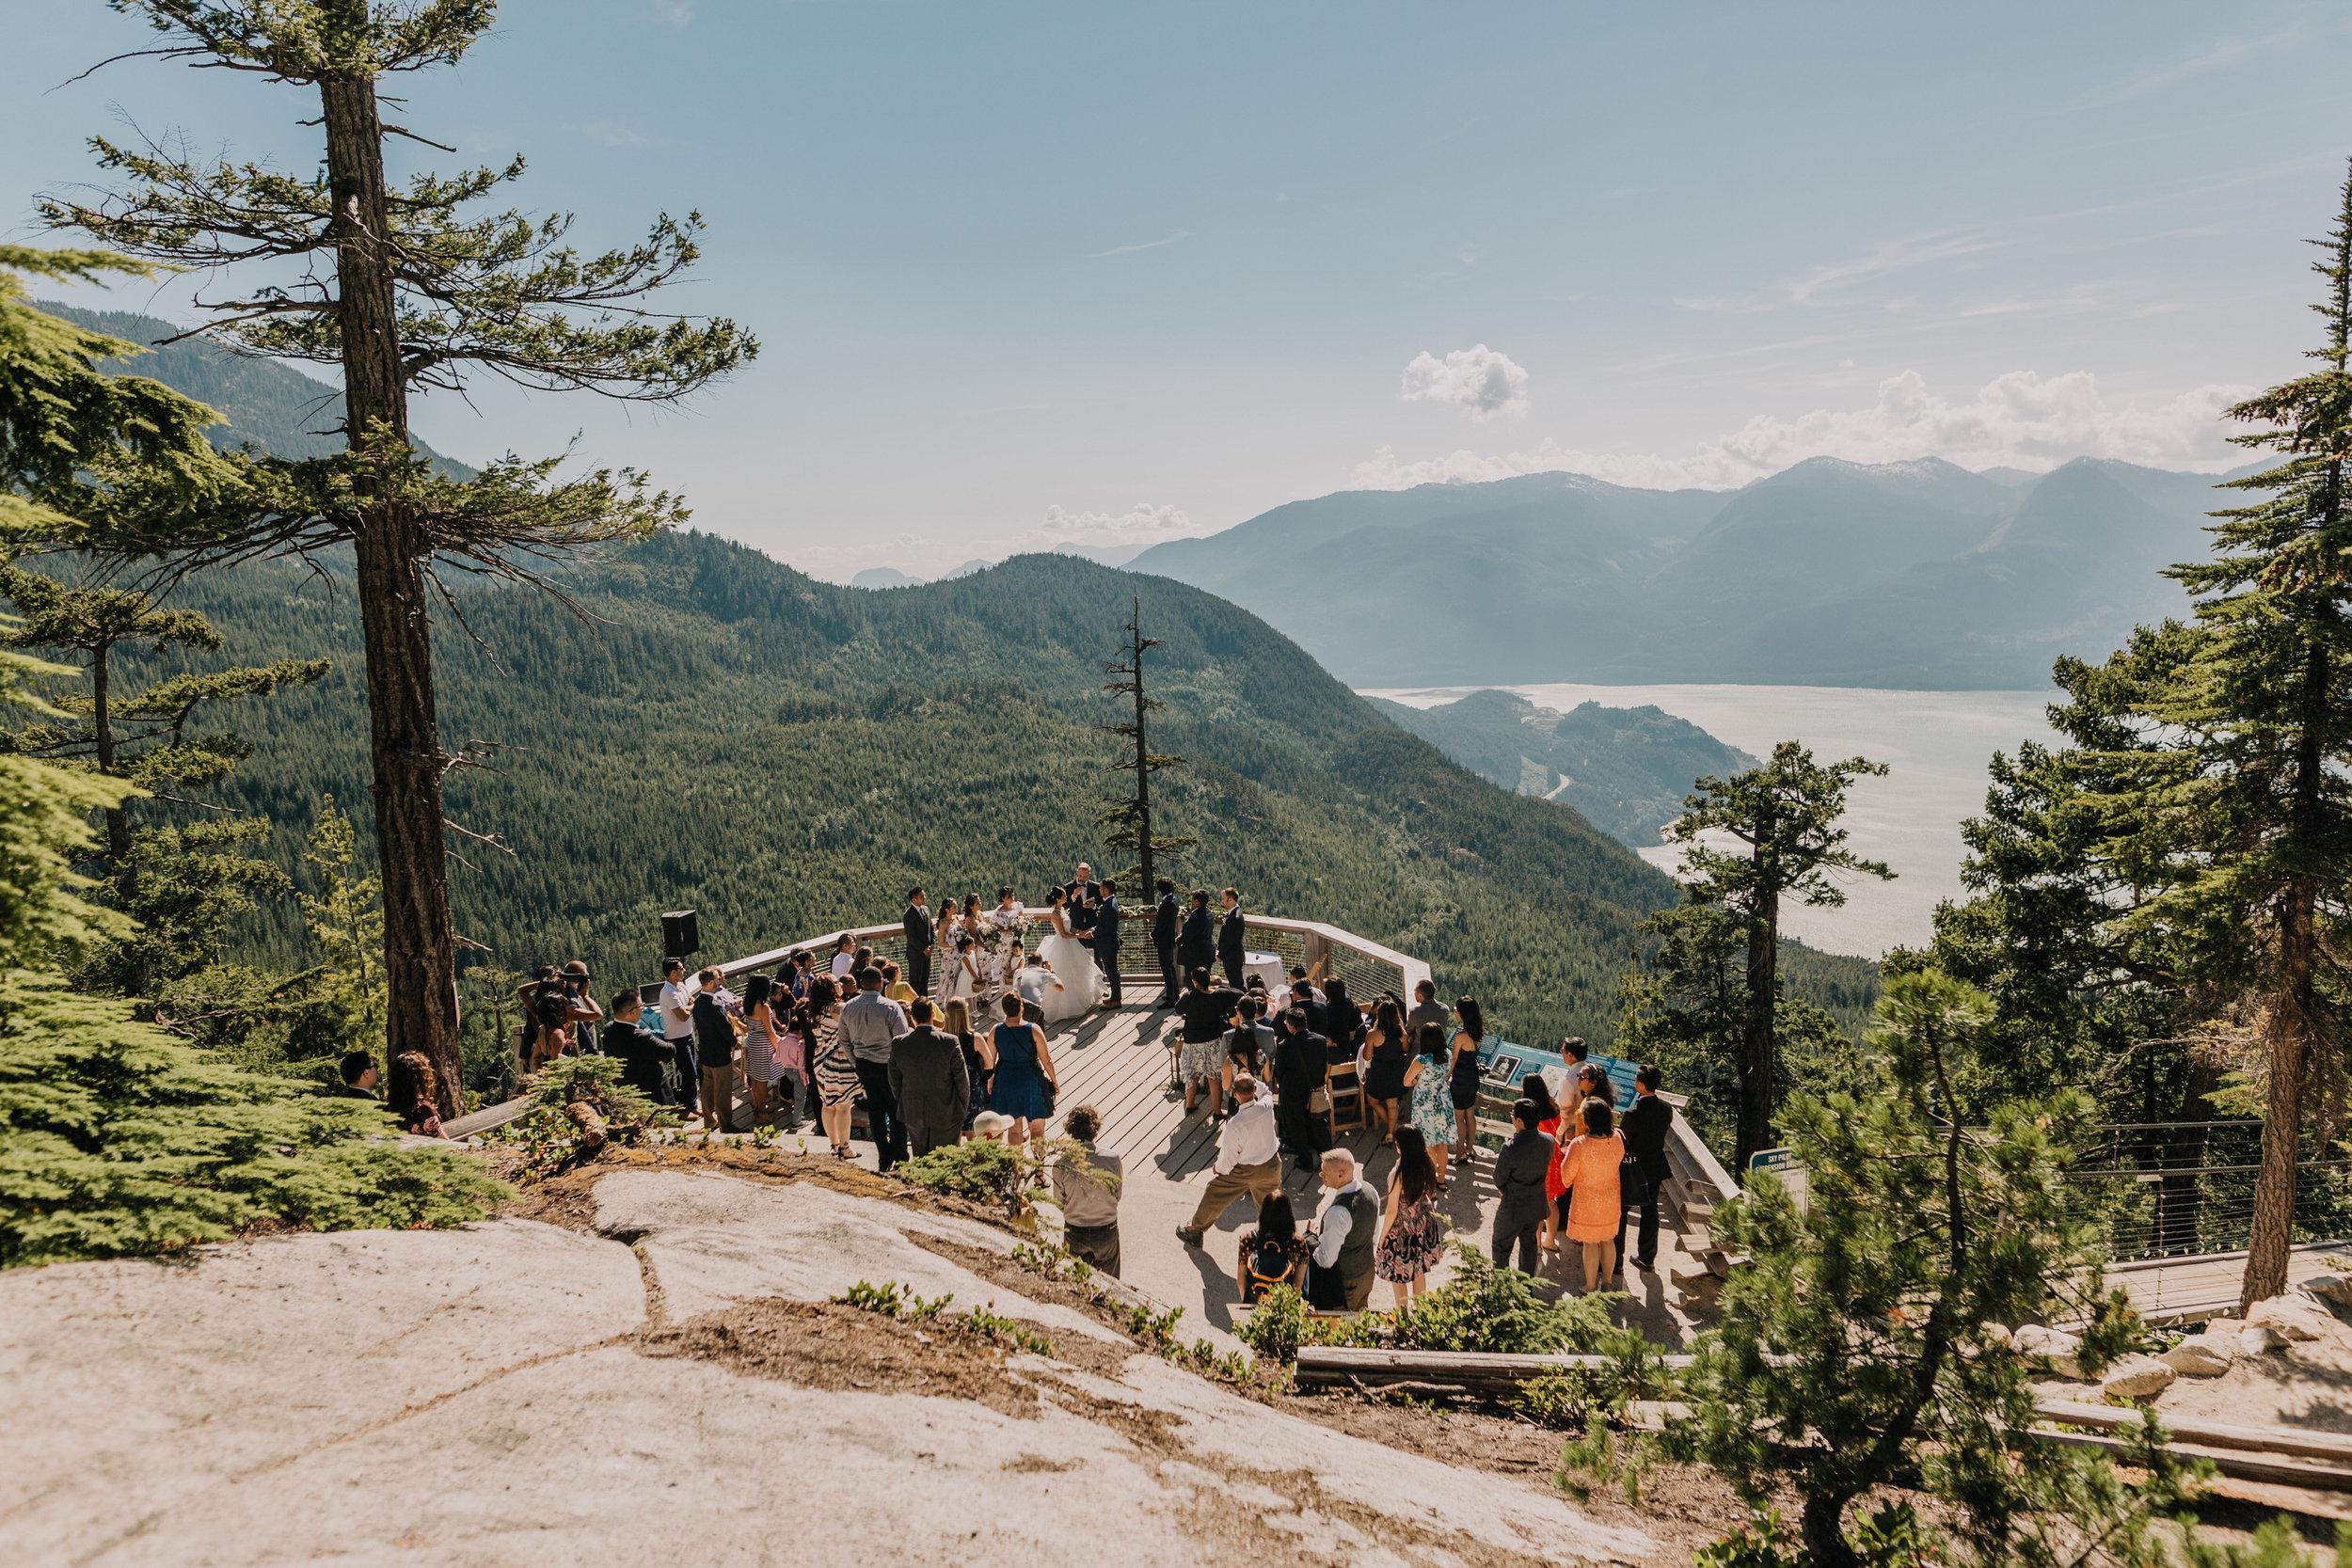 Squamish Wedding Photographer - Sea to Sky Gondola Wedding Photos -  Vancouver Wedding Photographer & Videographer - Sunshine Coast Wedding Photos - Sunshine Coast Wedding Photographer - Jennifer Picard Photography - IMG_3093.jpg